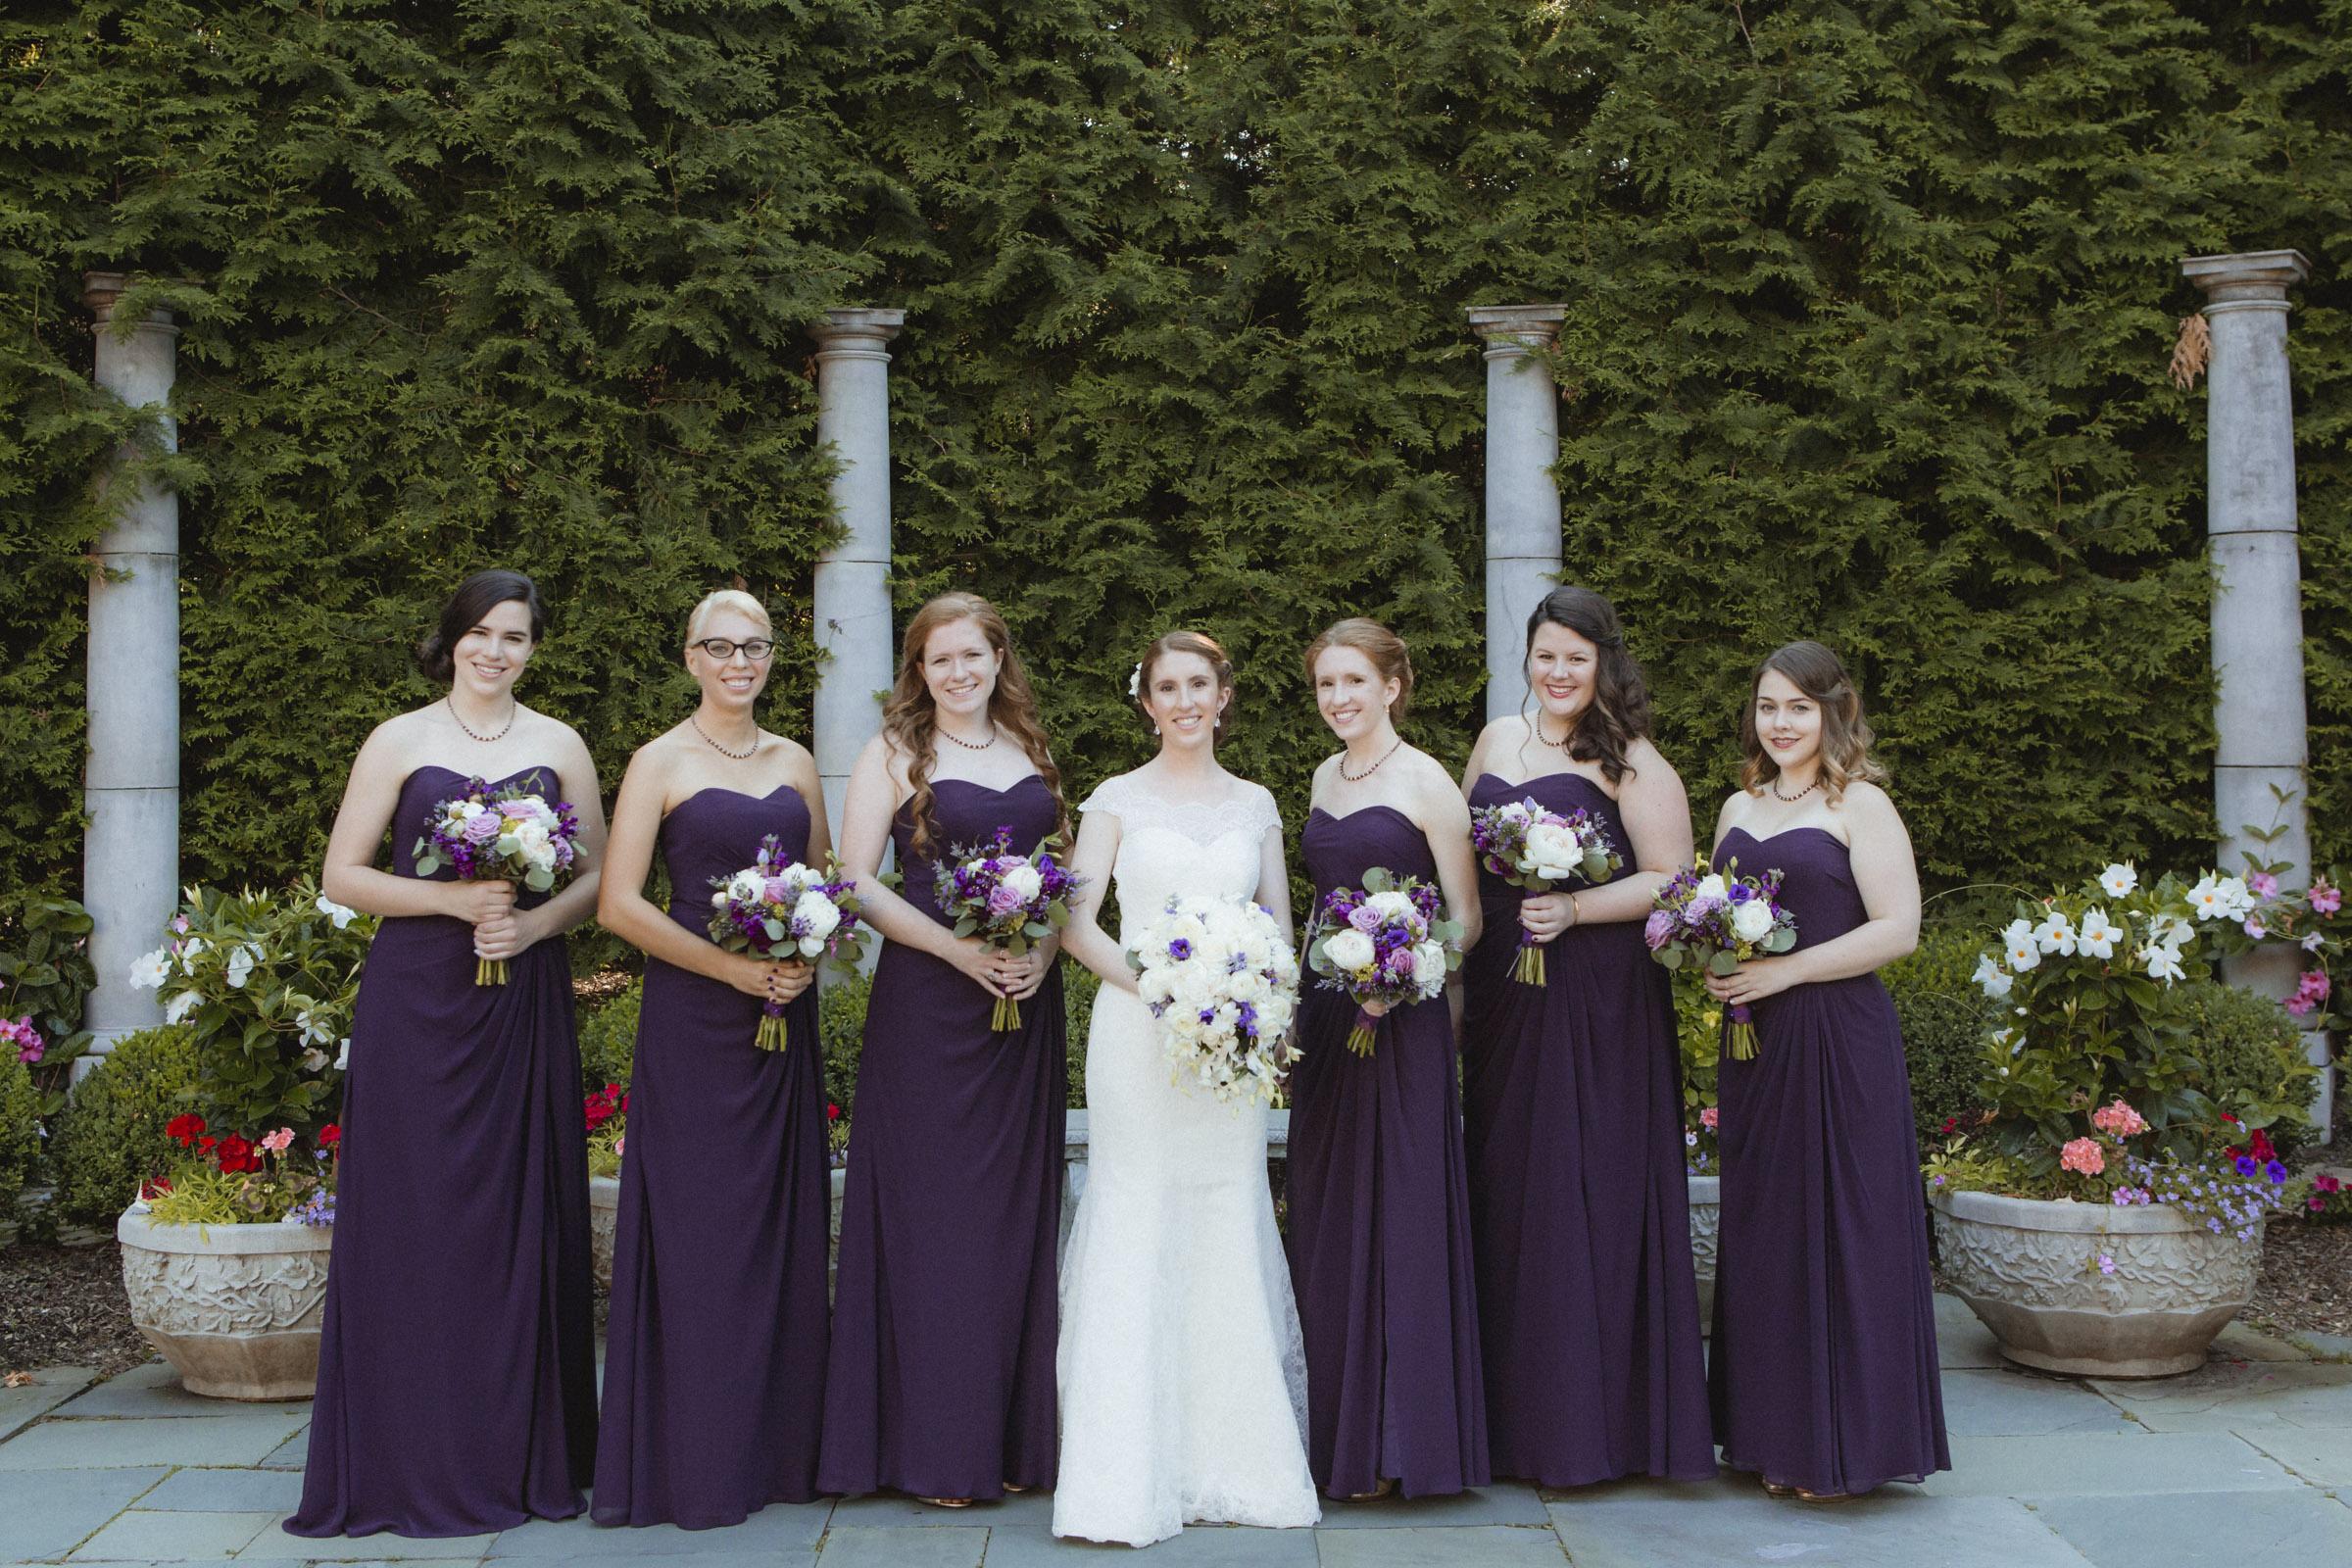 Bride wears lace, Augusta Jones gown, Bridesmaids wear floor length, purple, Bill Levkoff gowns - Estate at Florentine Gardens wedding - Hudson Valley Wedding - Kelsey & Anish's wedding - Amy Sims Photography